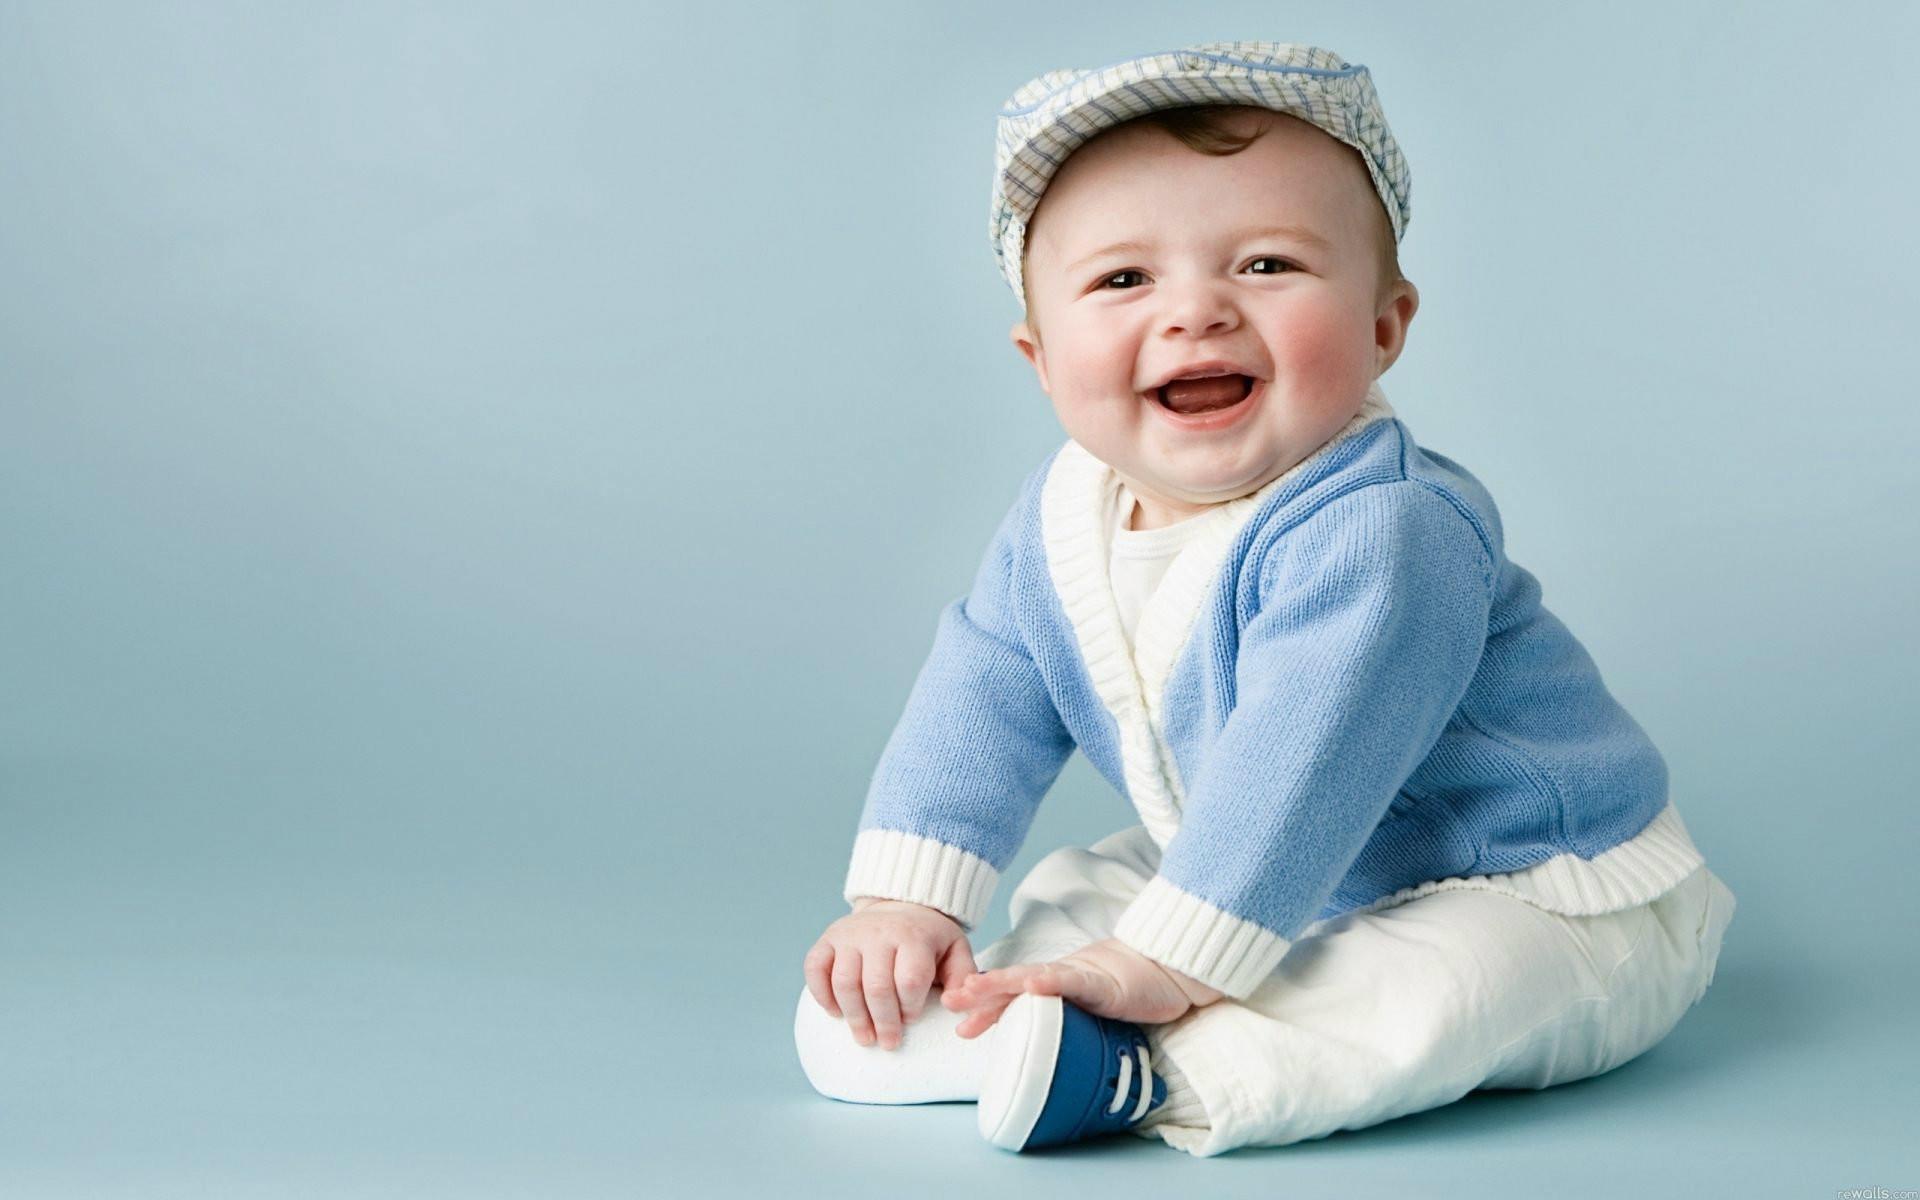 Cute Baby Boy Wallpapers 1